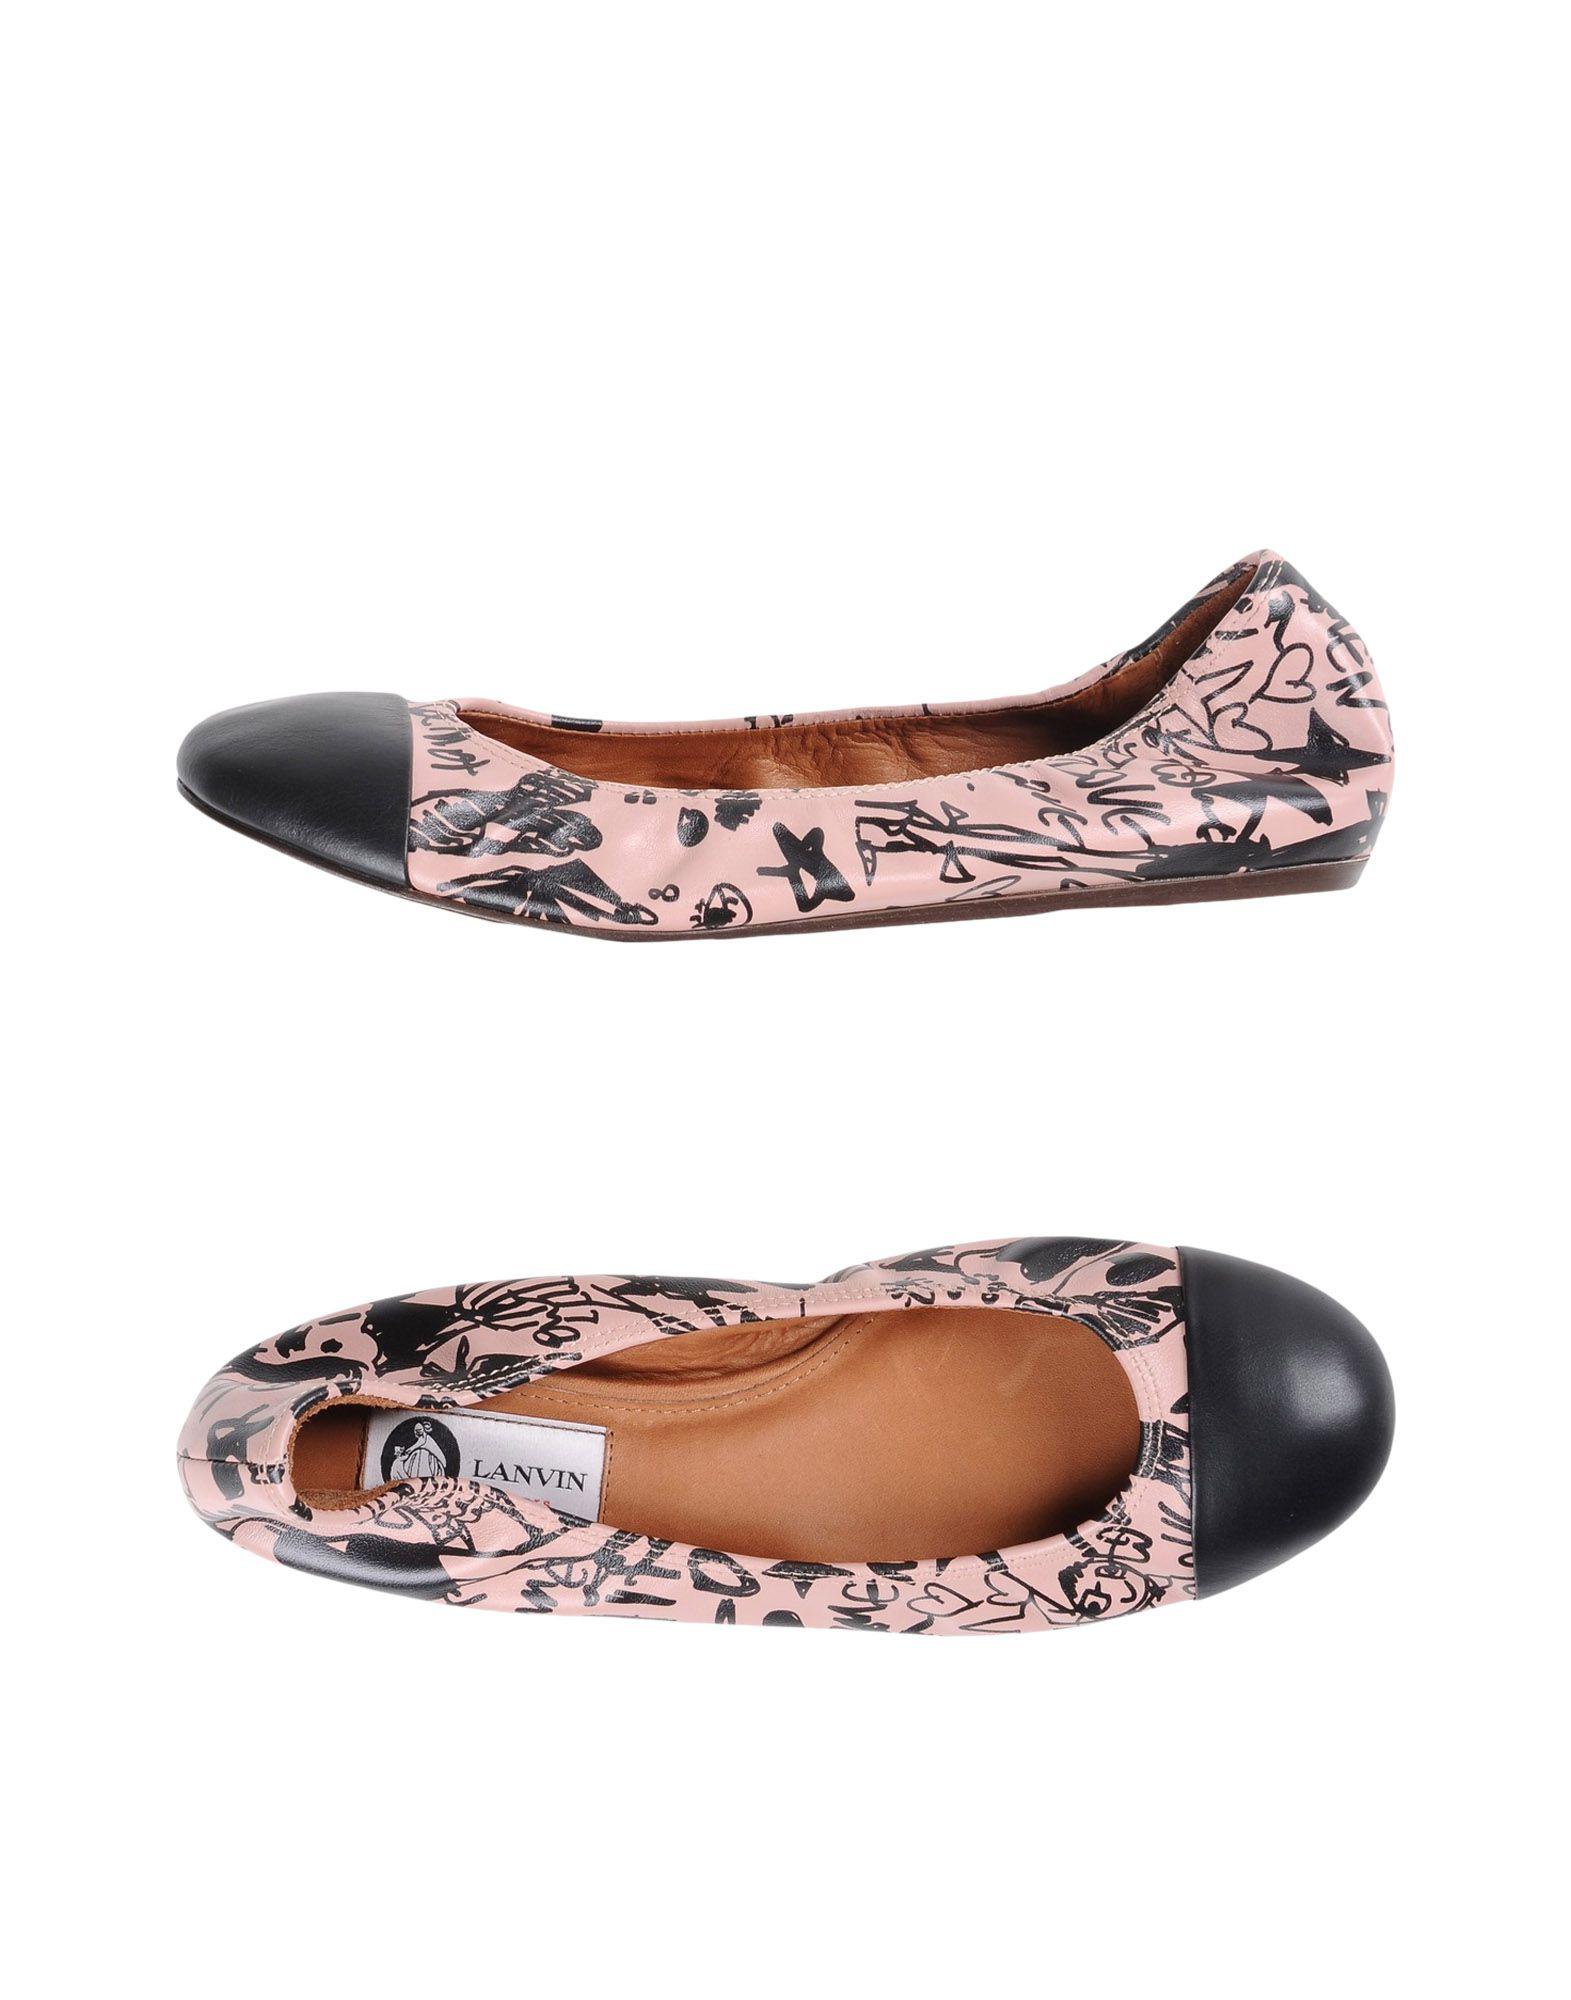 Lanvin gut Ballerinas Damen  11216488MMGünstige gut Lanvin aussehende Schuhe 4e9902